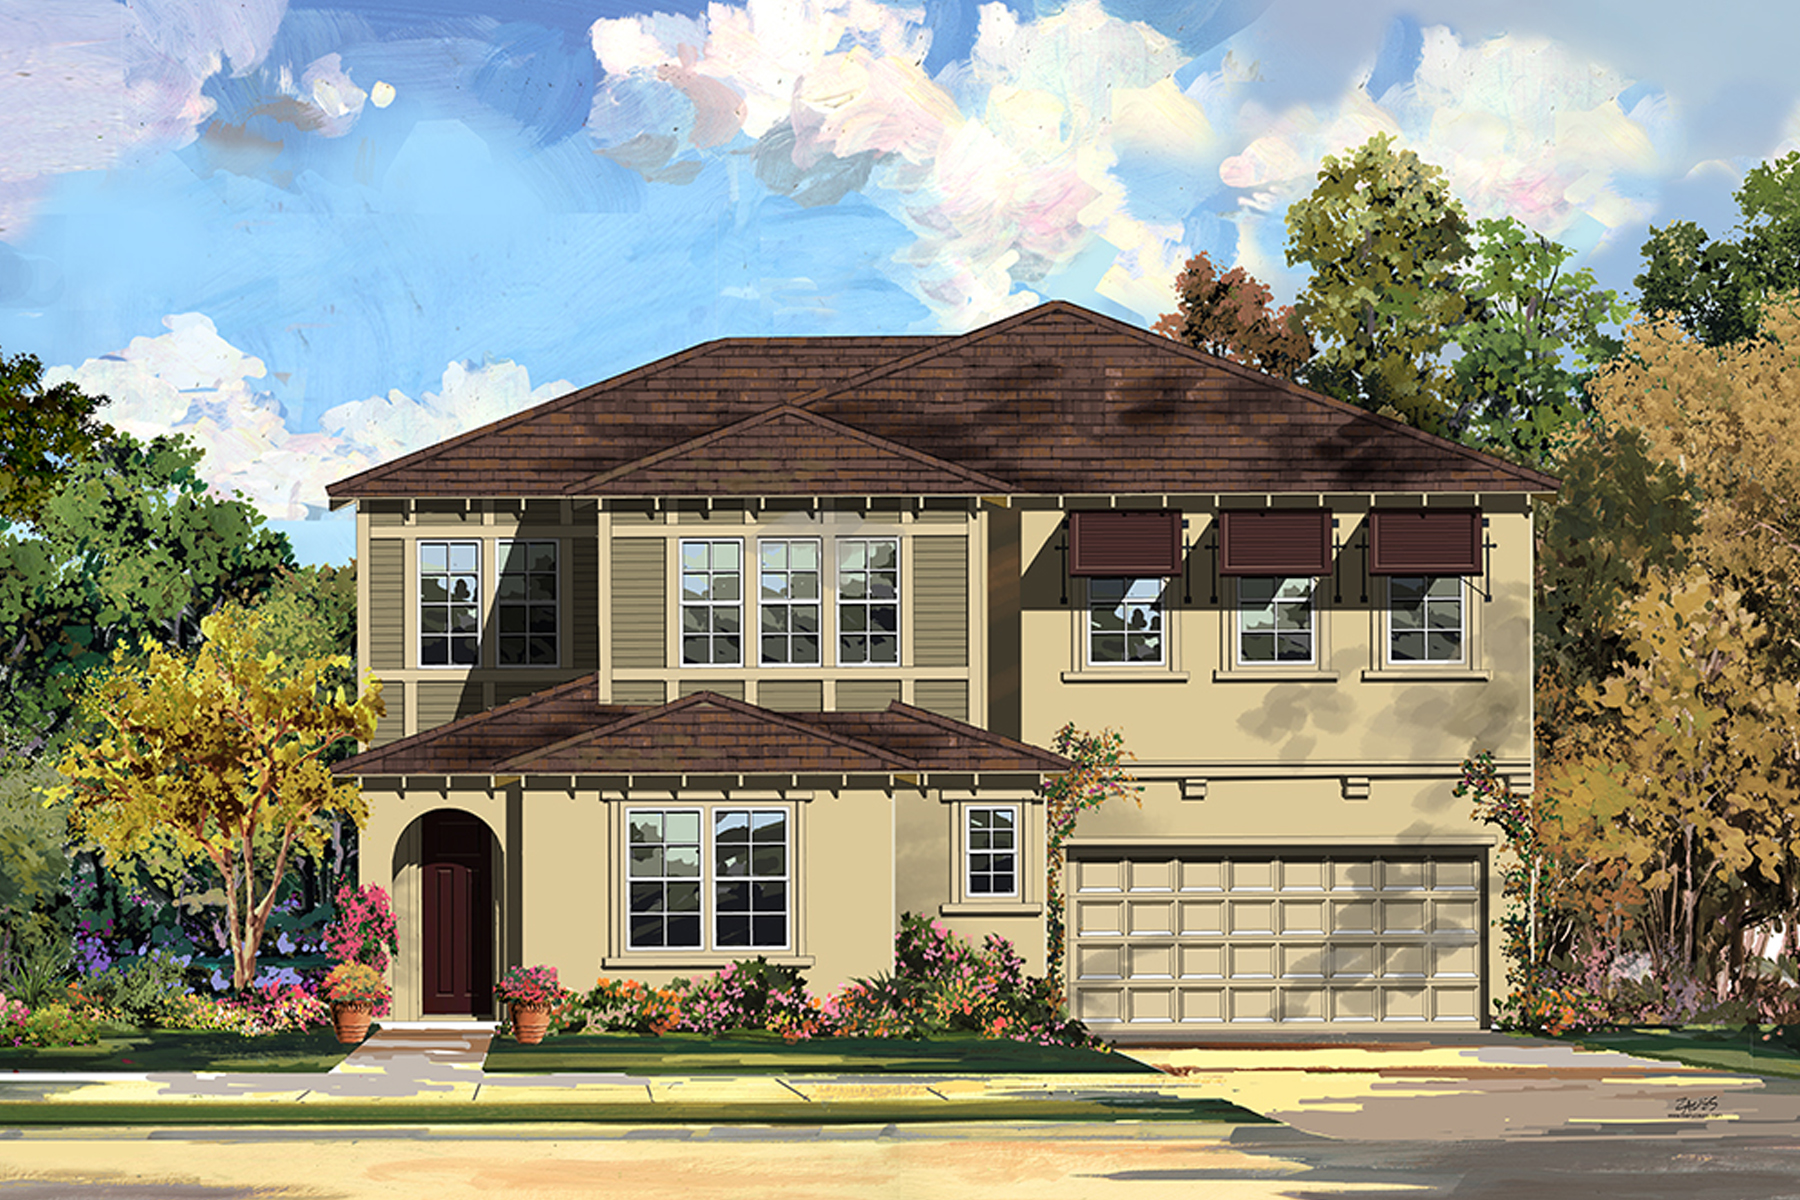 wisteria, azusa new homes, rosedale, azusa ca,